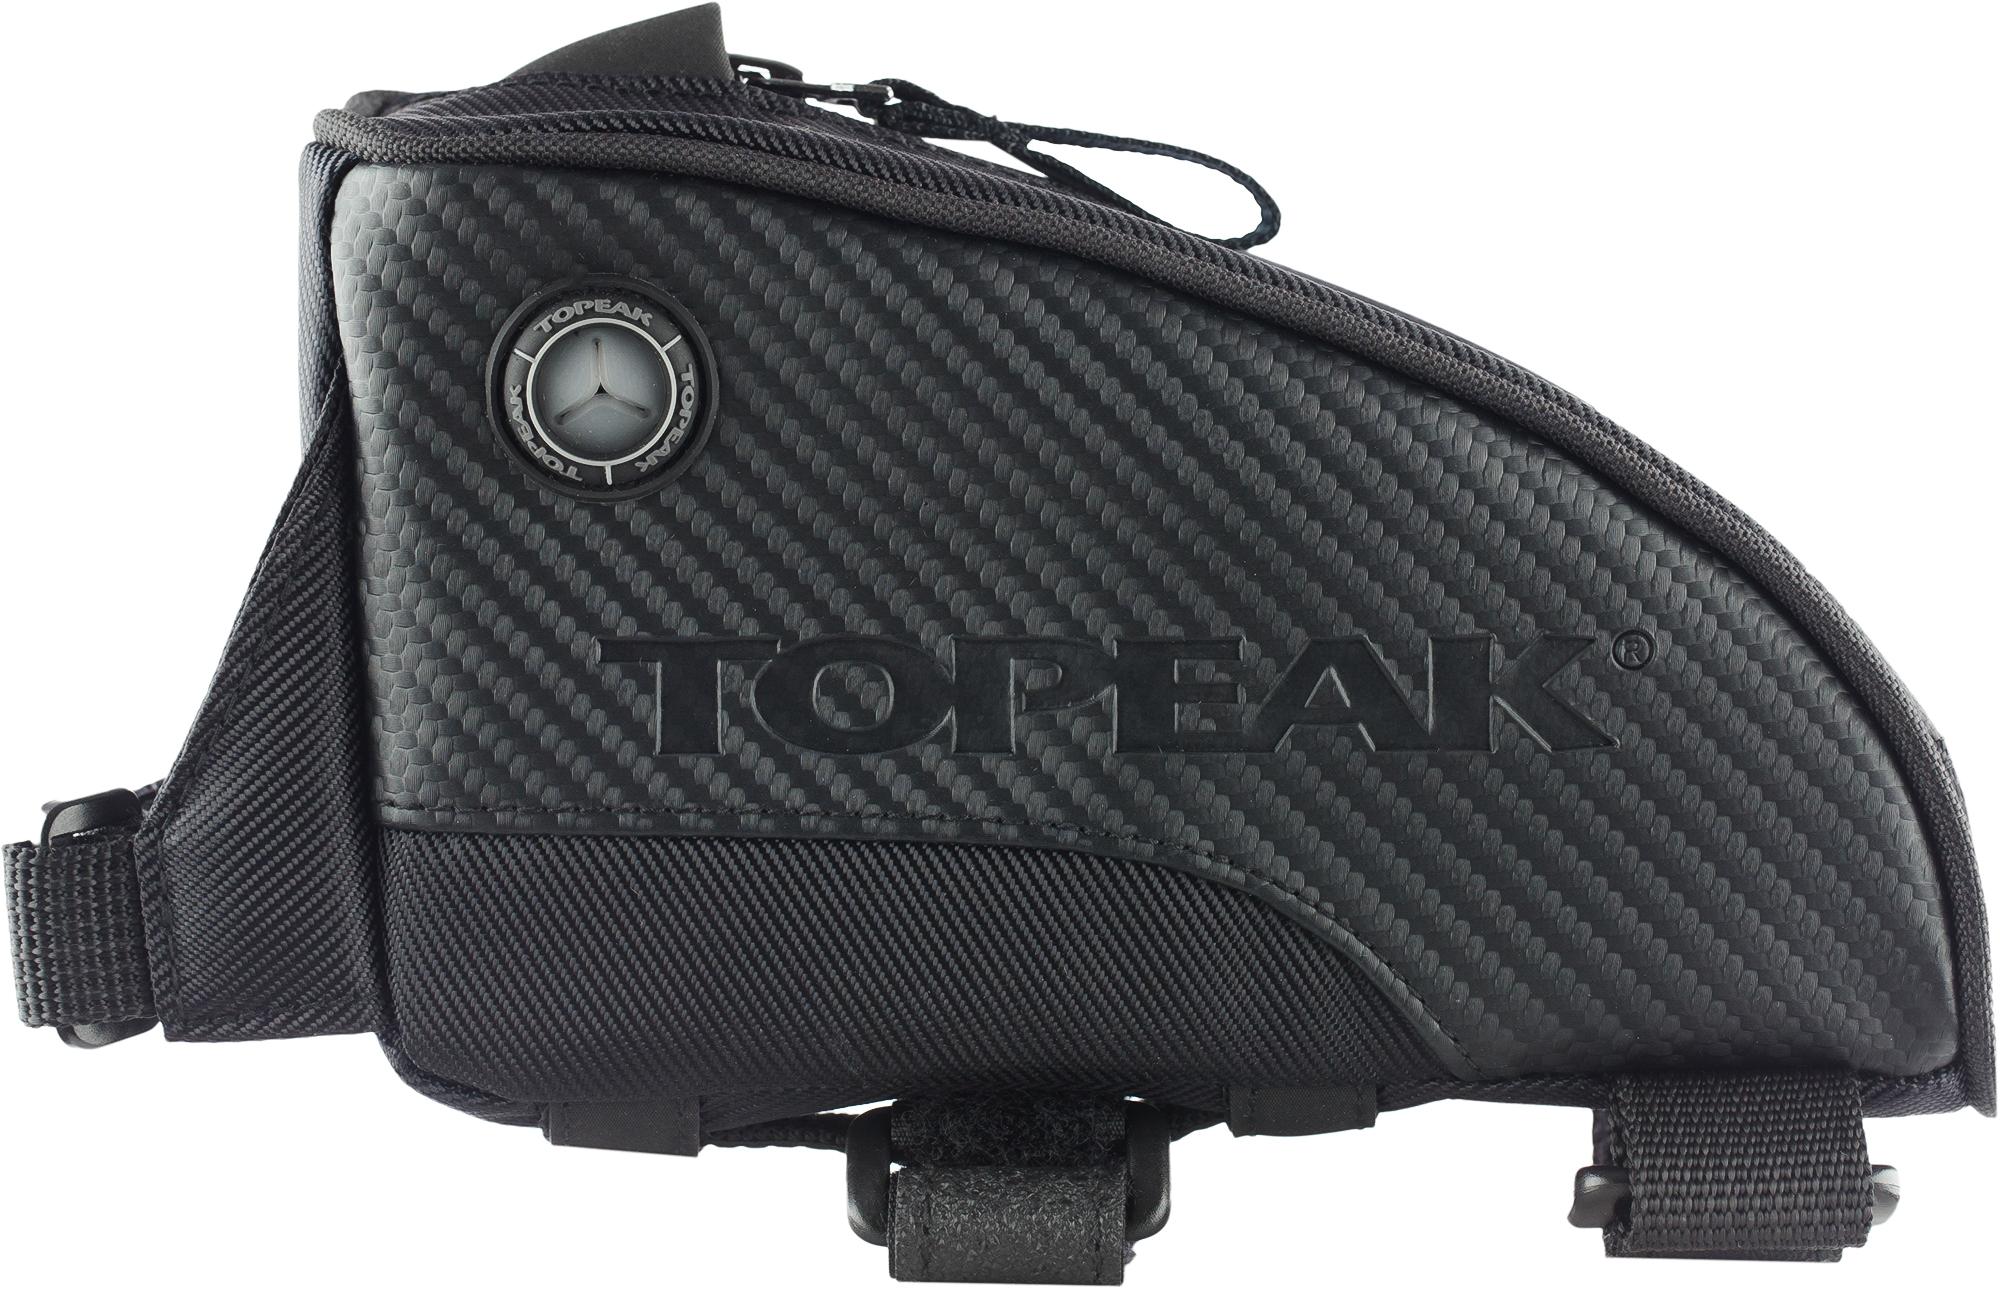 TOPEAK Велосипедная сумка TOPEAK topeak mini rocket iglow